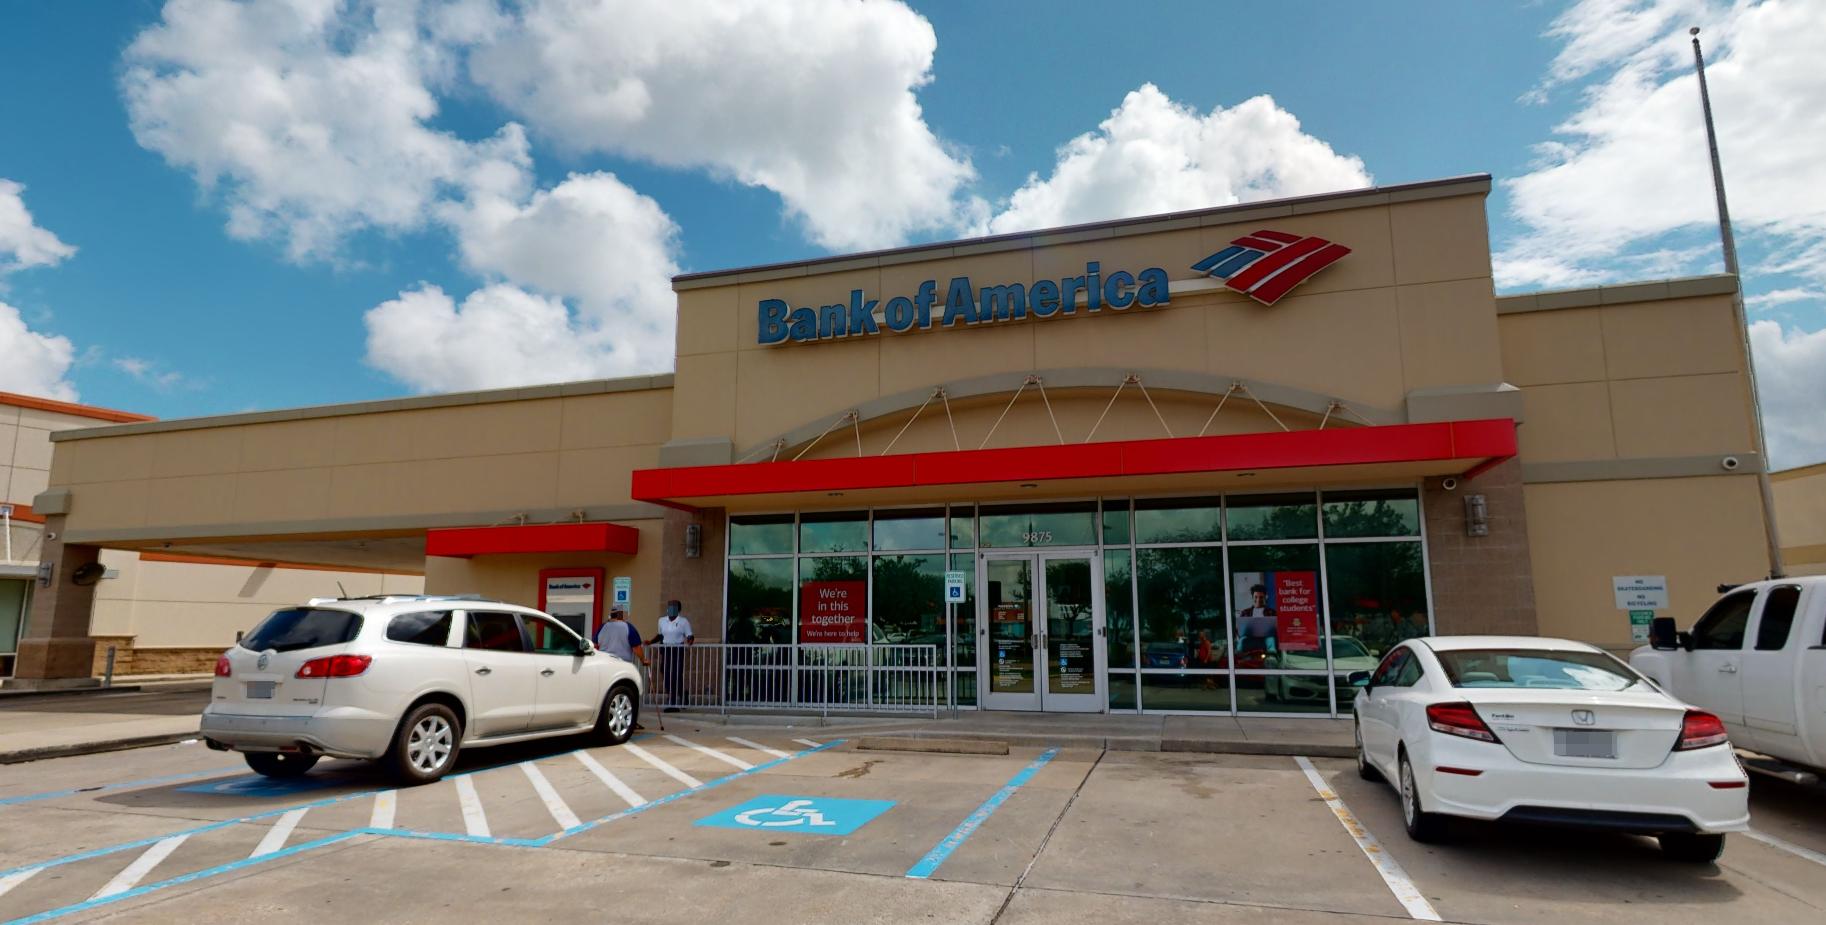 Bank of America financial center with drive-thru ATM and teller | 9875 Blackhawk Blvd, Houston, TX 77075